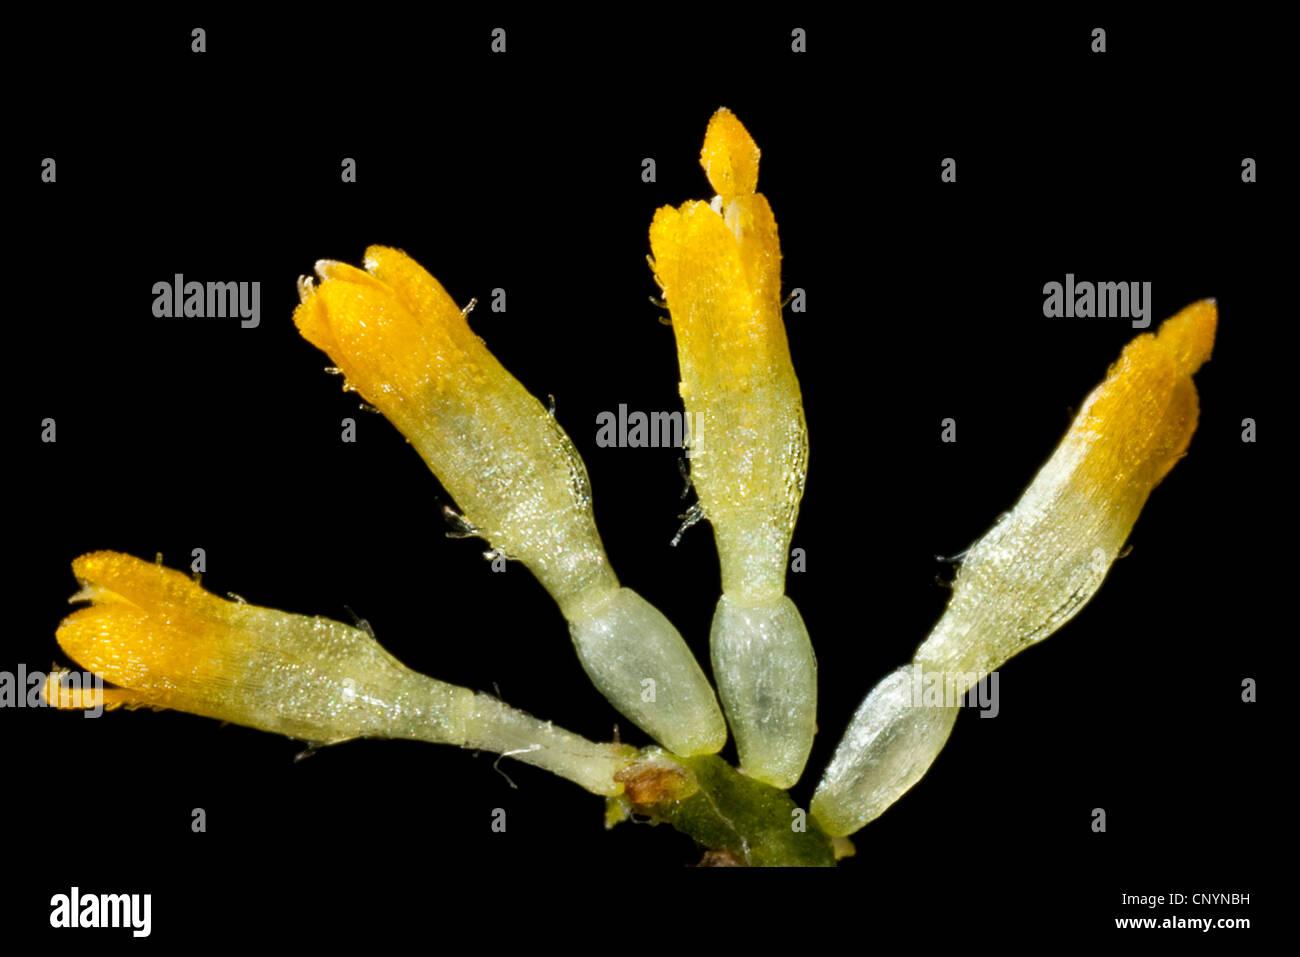 common daisy, lawn daisy, English daisy (Bellis perennis), isolated tubular flowers, Germany - Stock Image